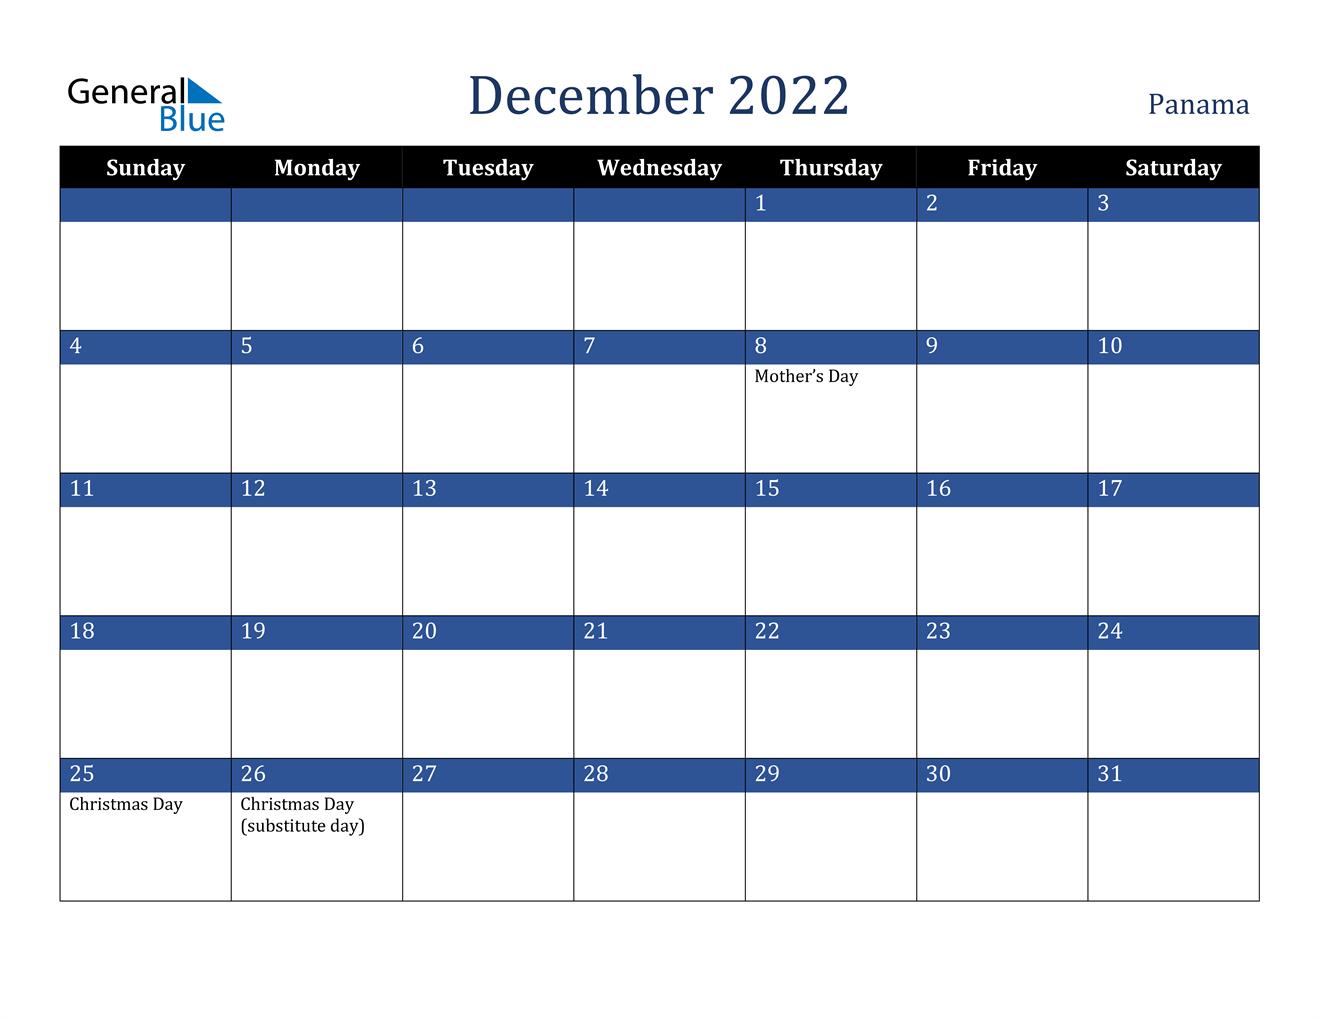 December 2022 Calendar - Panama